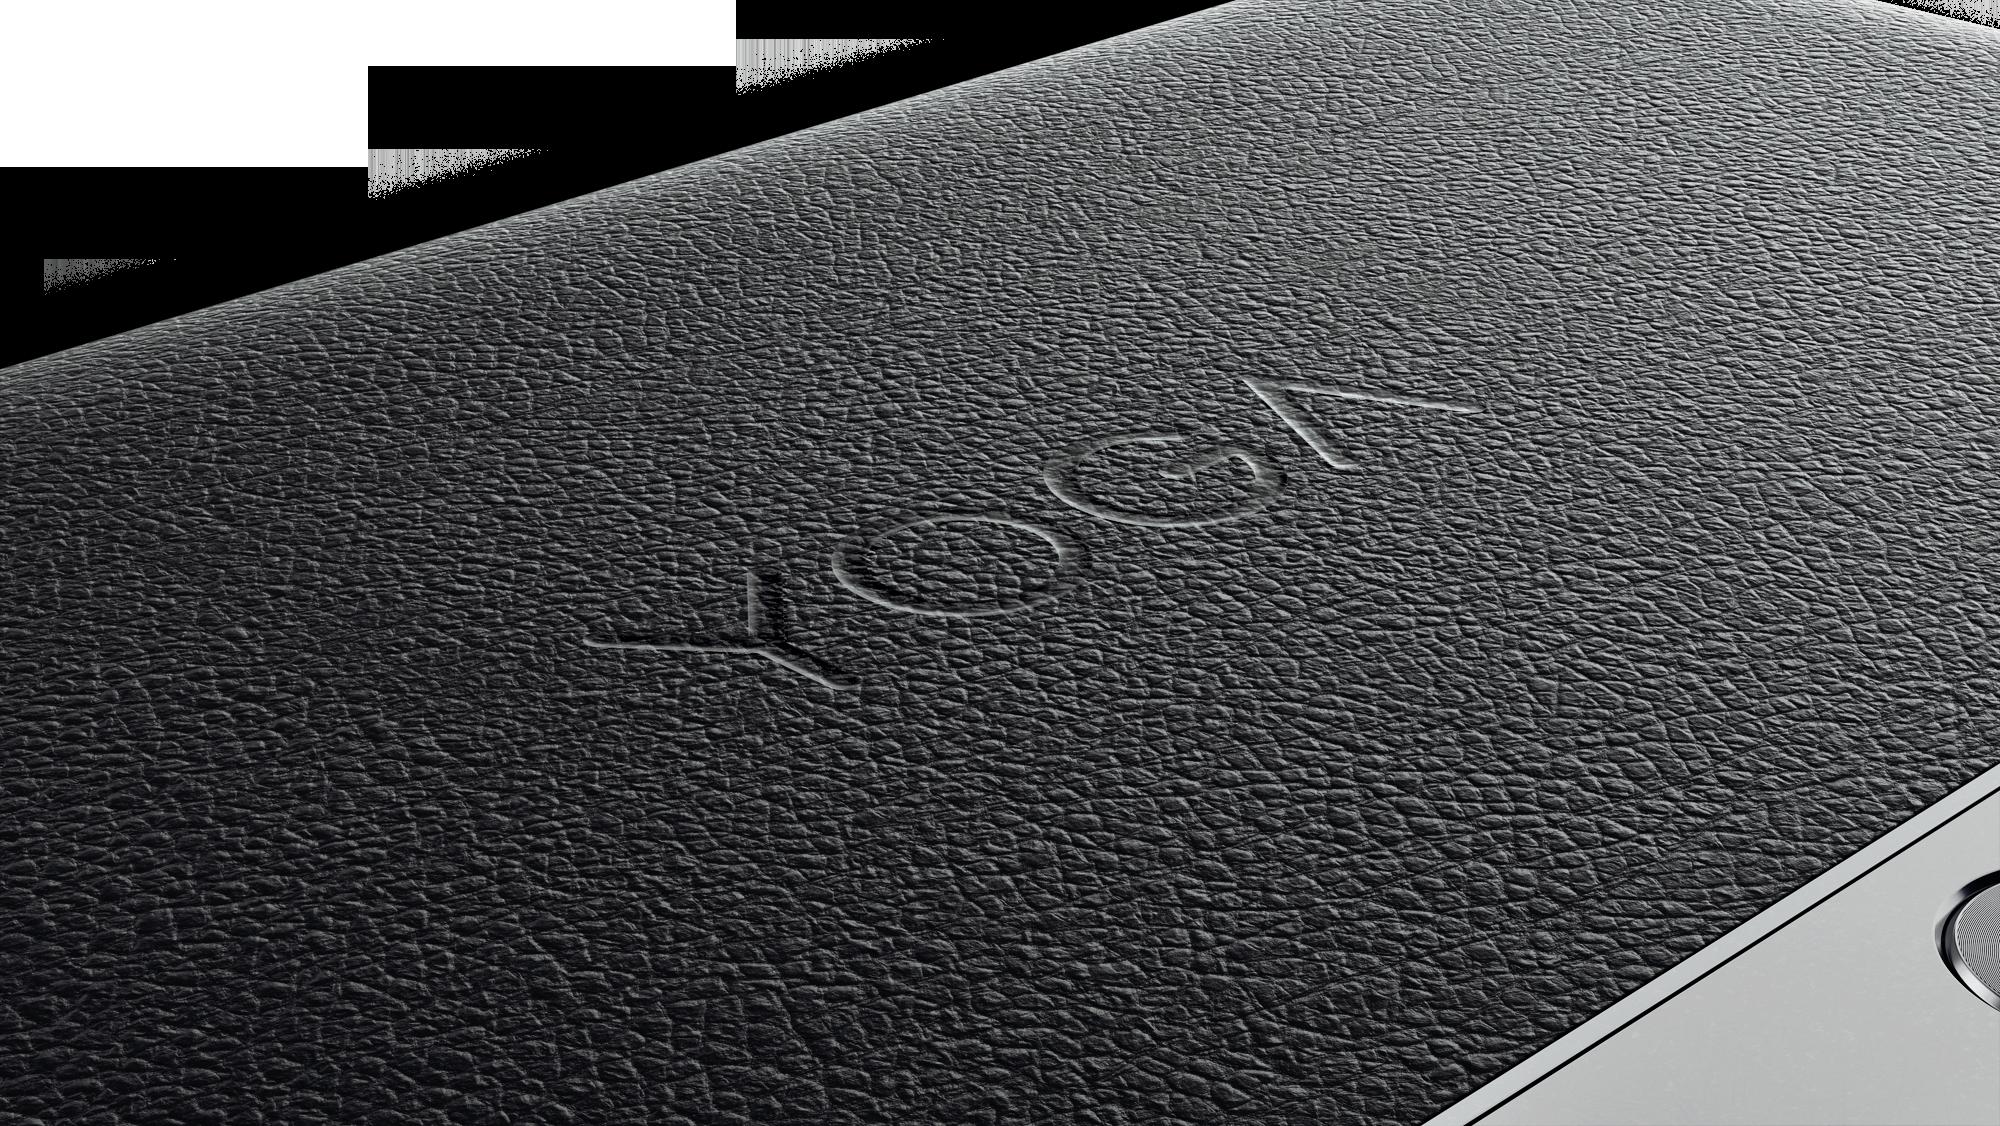 Lenovo S Yoga Tab 3 Plus Brings More Power For Multimedia